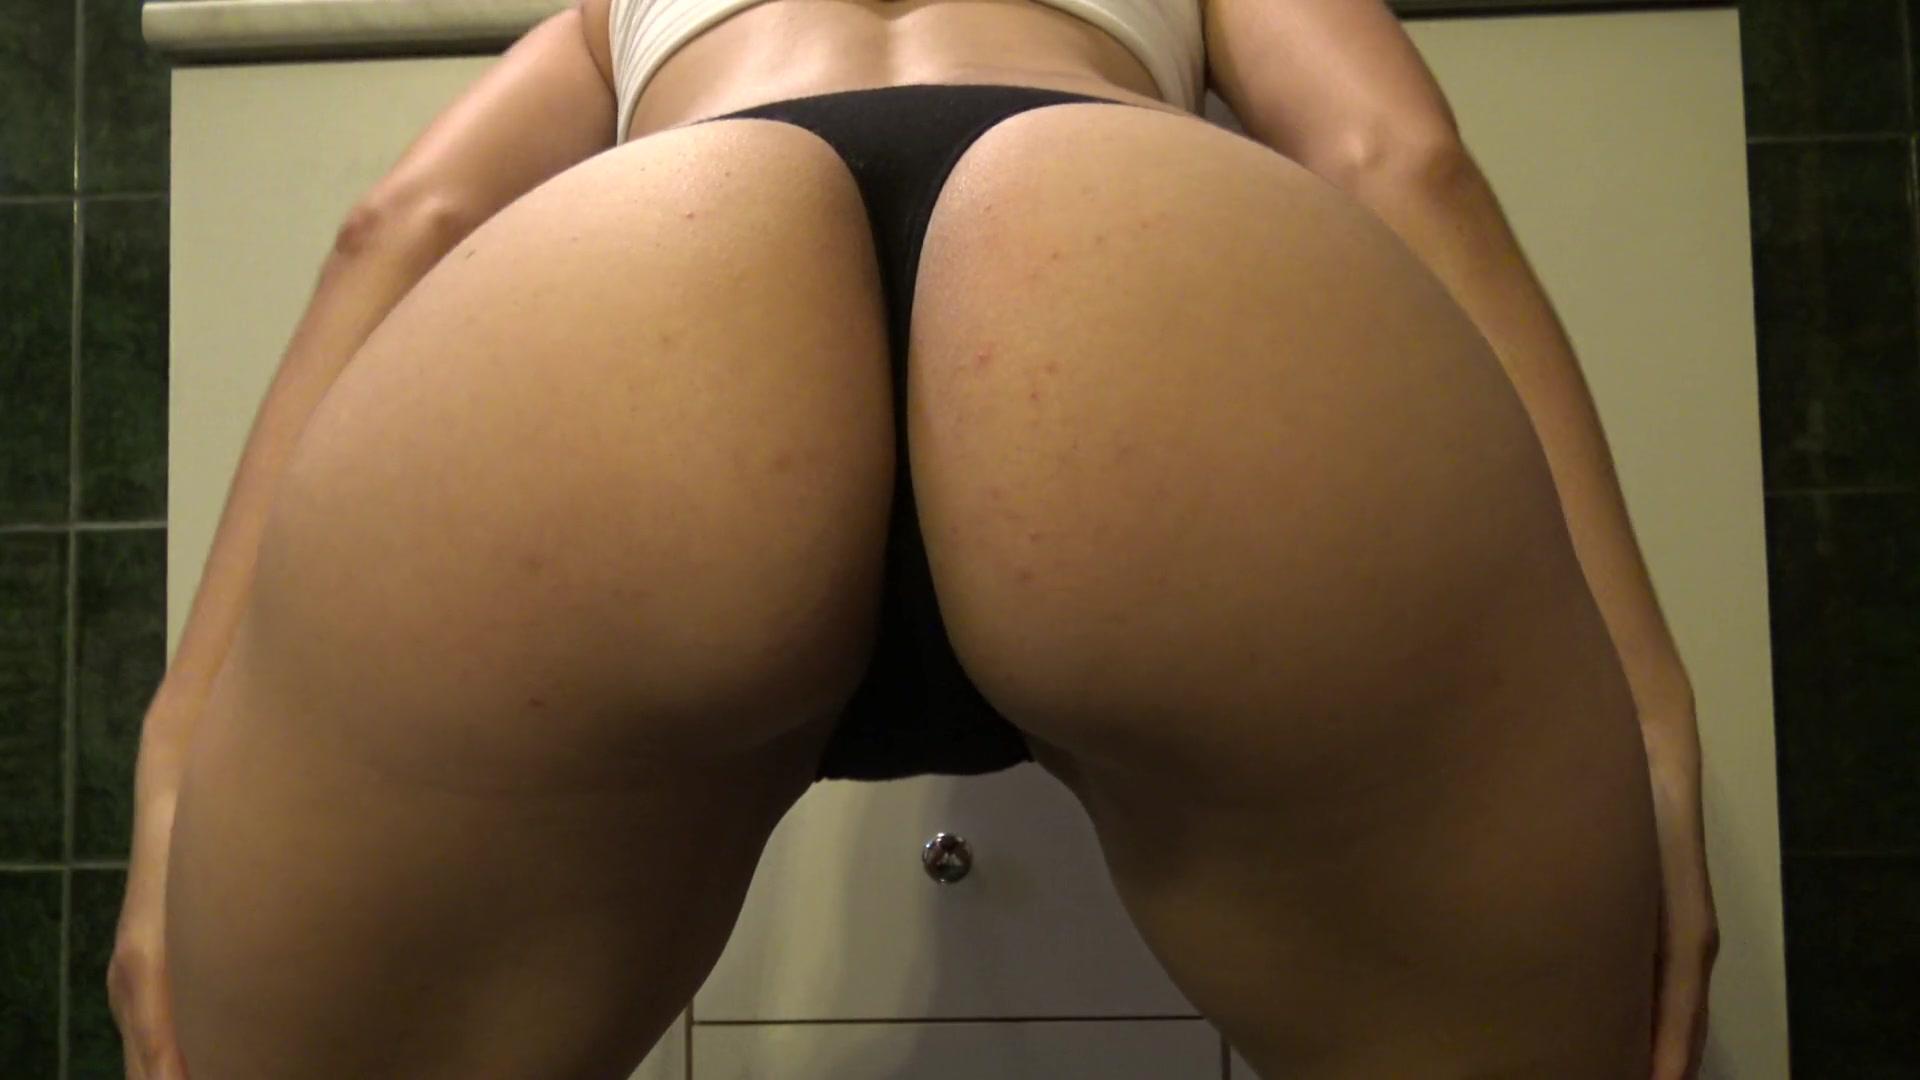 Bubble big butt in panties Bubble Butt Teen Peeing In Black Panties 4k Big Ass Tease Panty Pissing Filtercams